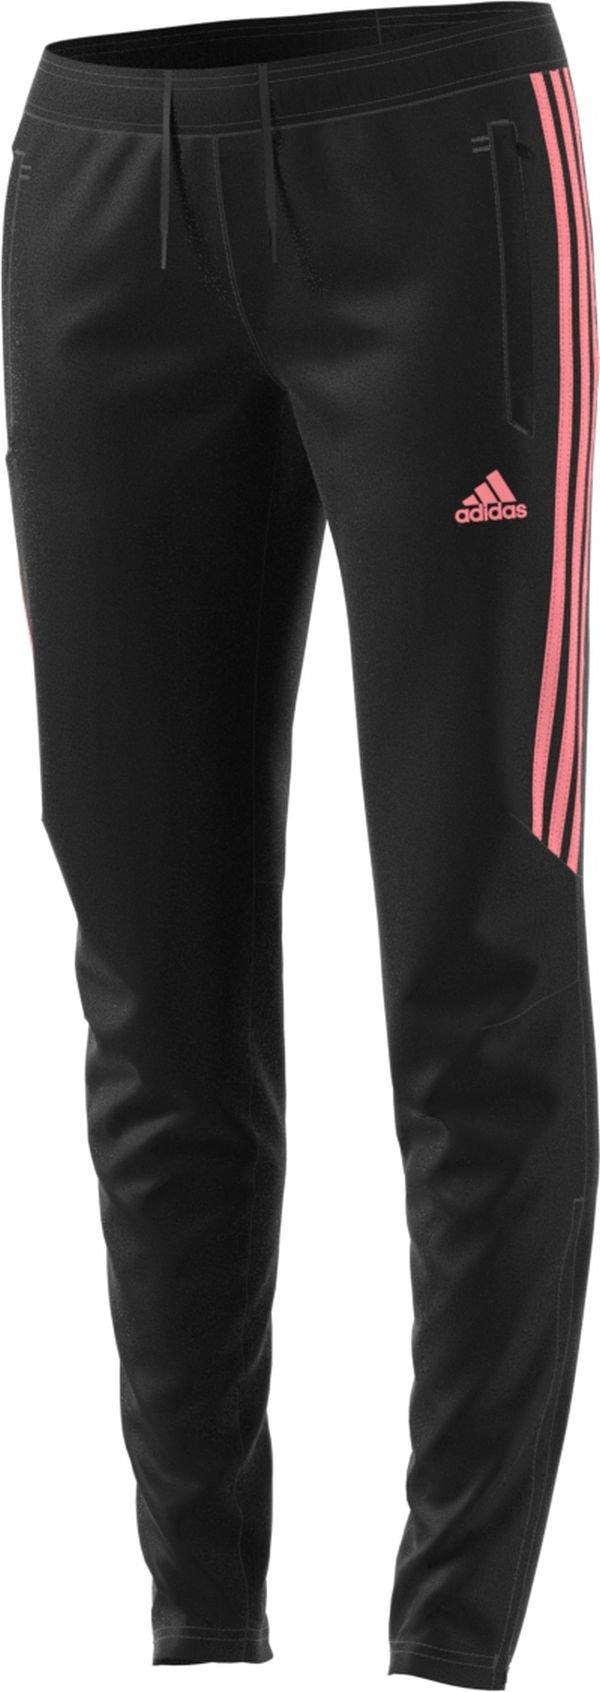 adidas Women's Soccer Tiro 17 Training Pants, Black/Light Flash Red, Medium by adidas